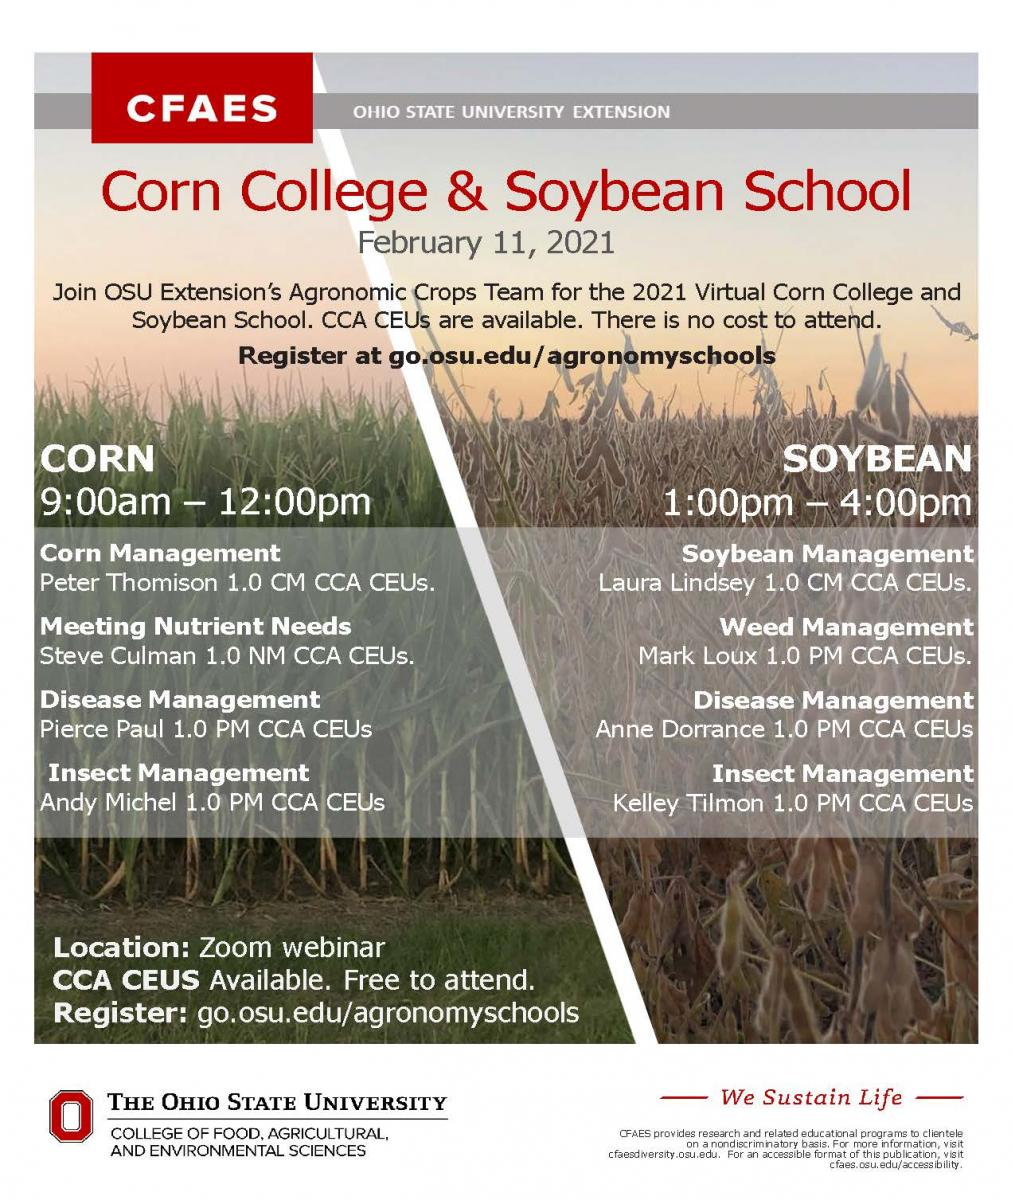 Corn College & Soybean School